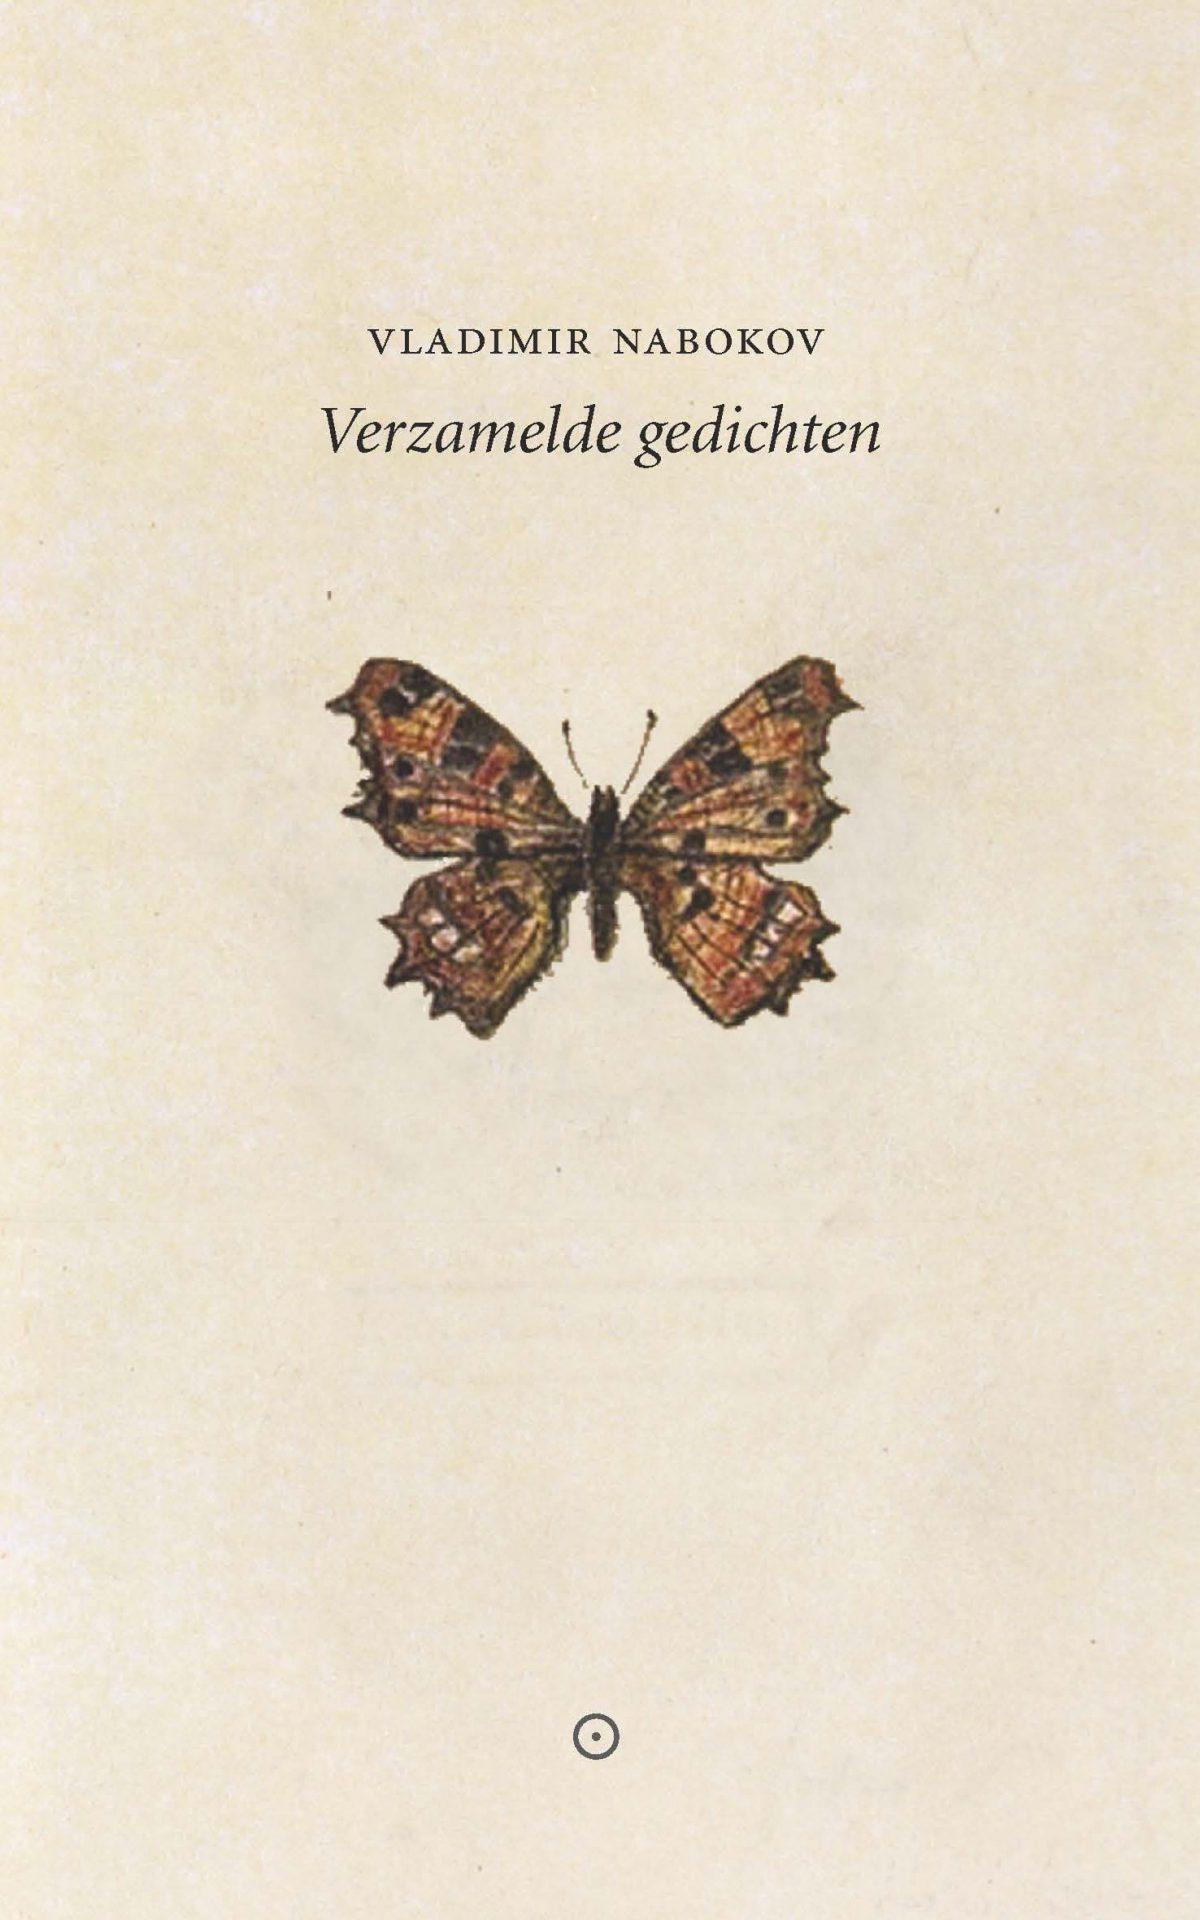 Verzamelde gedichten – Vladimir Nabokov